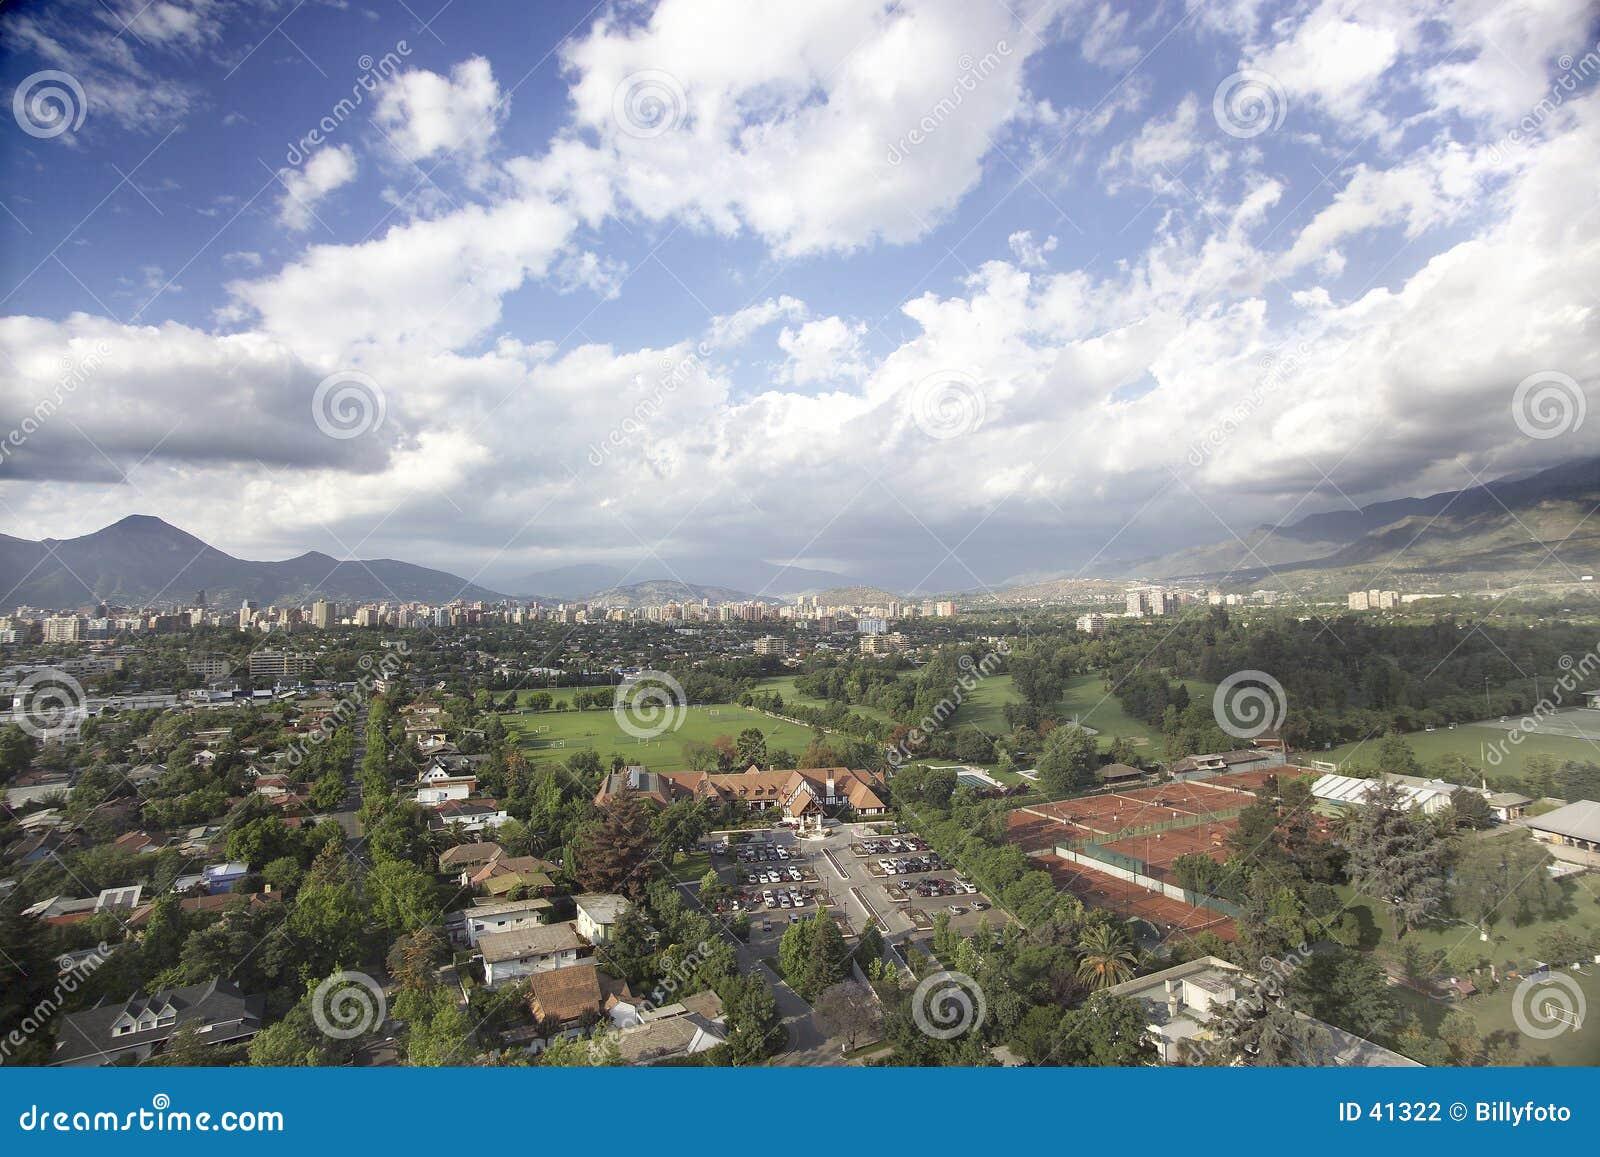 Santiago after the rain